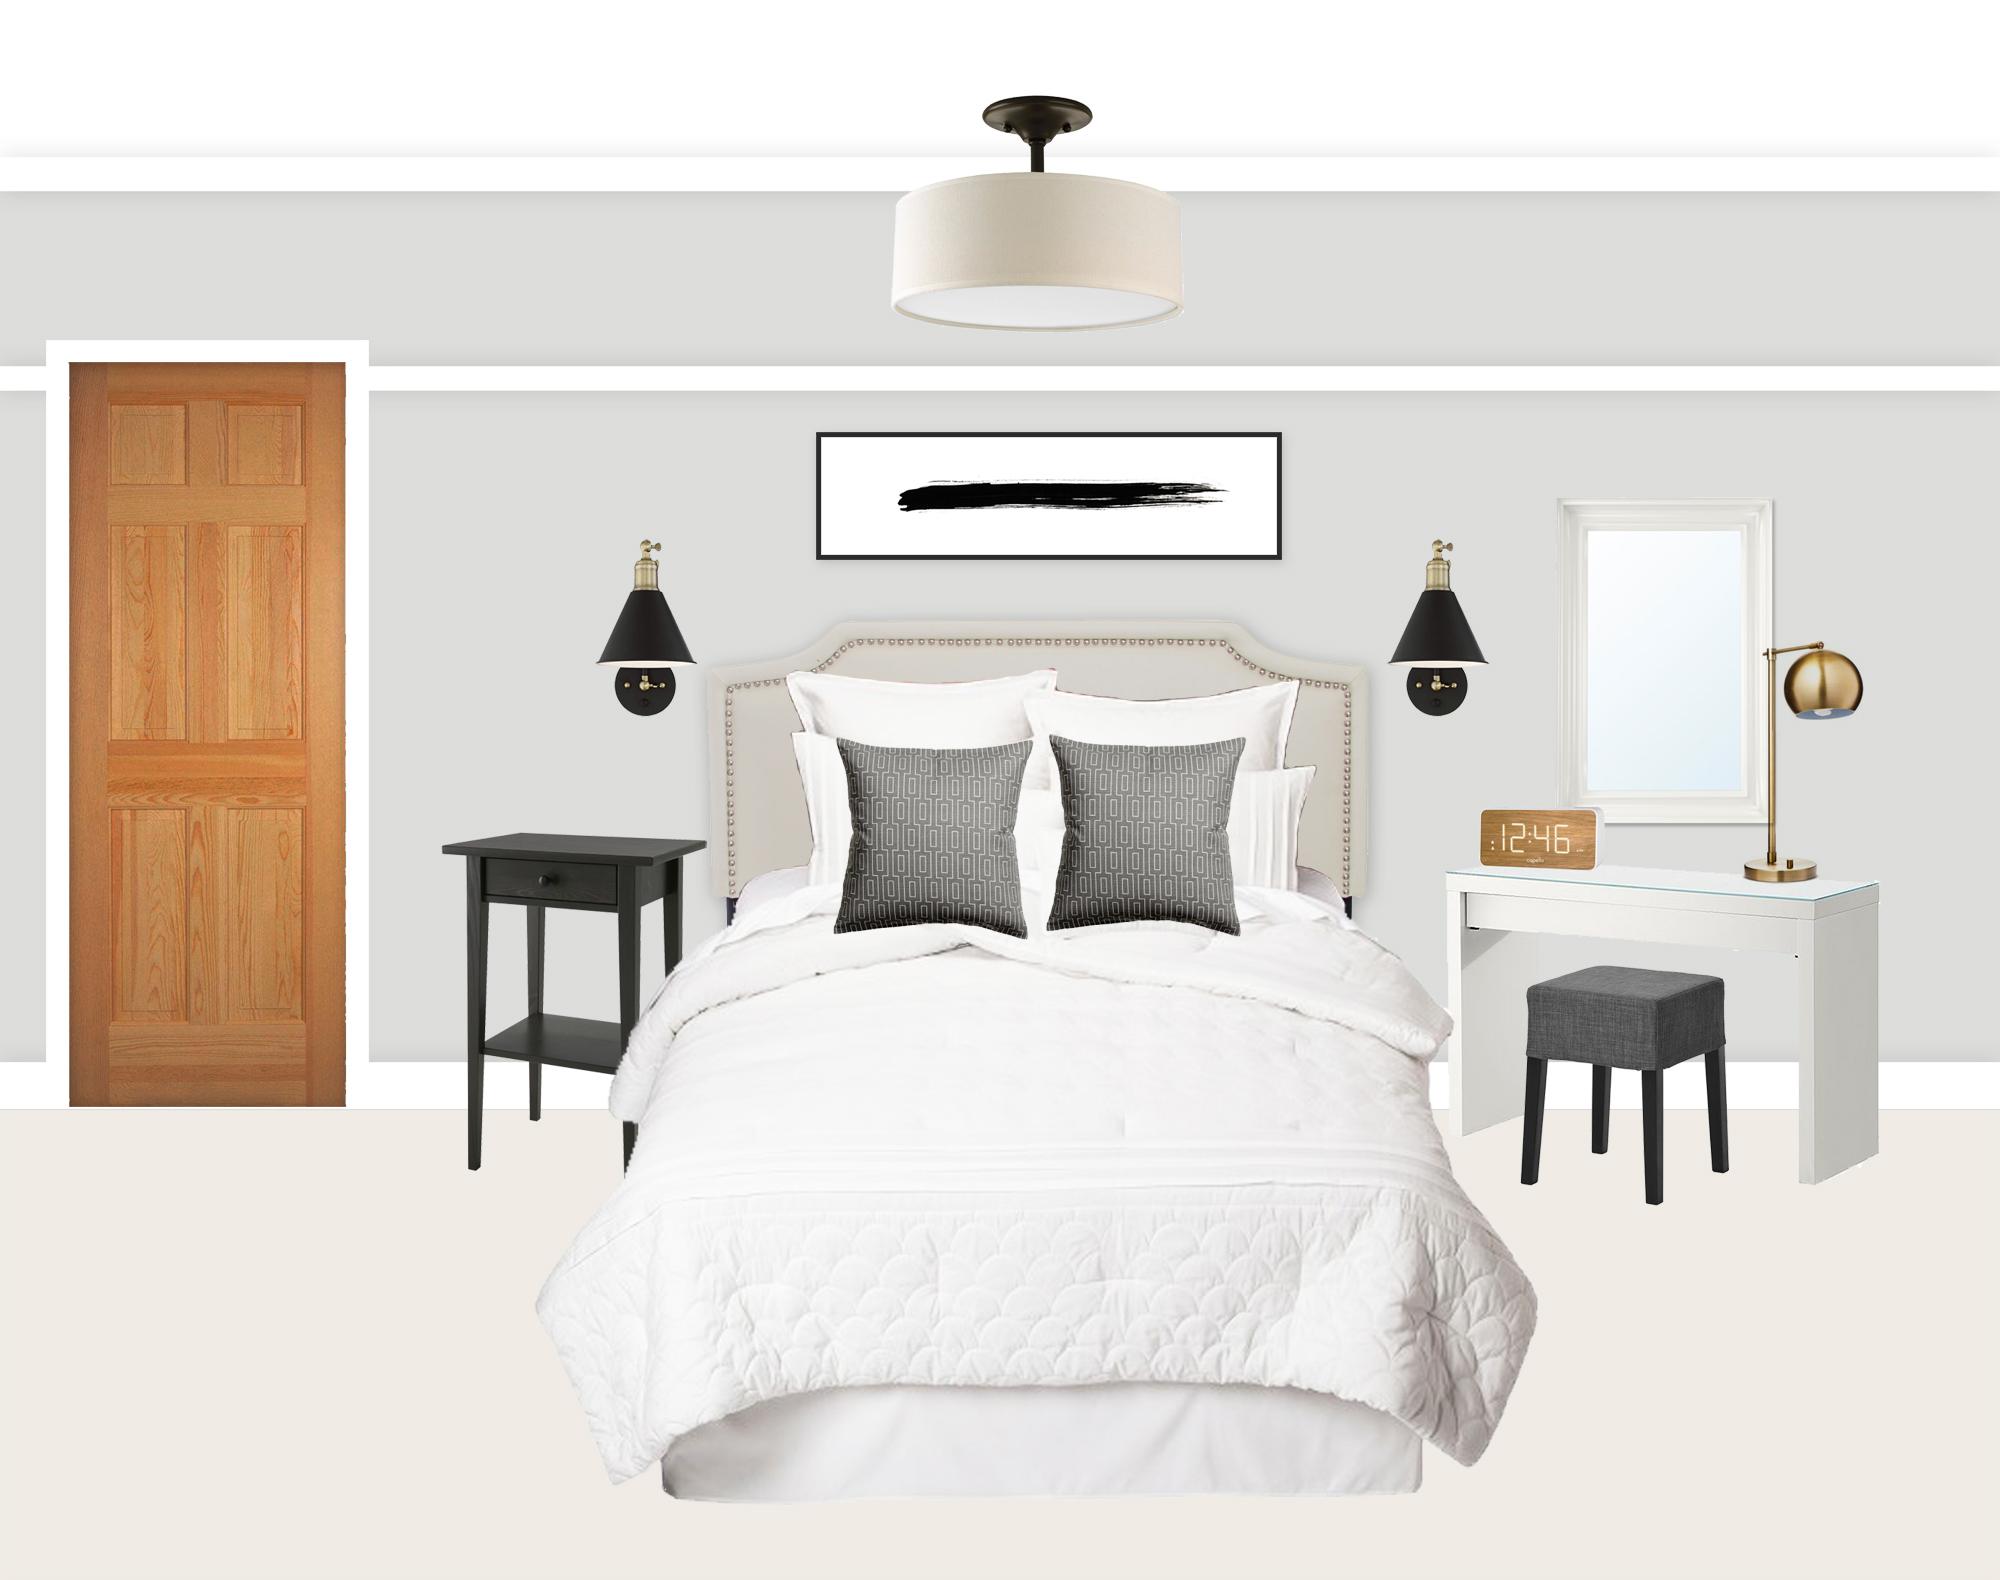 Master bedroom design board